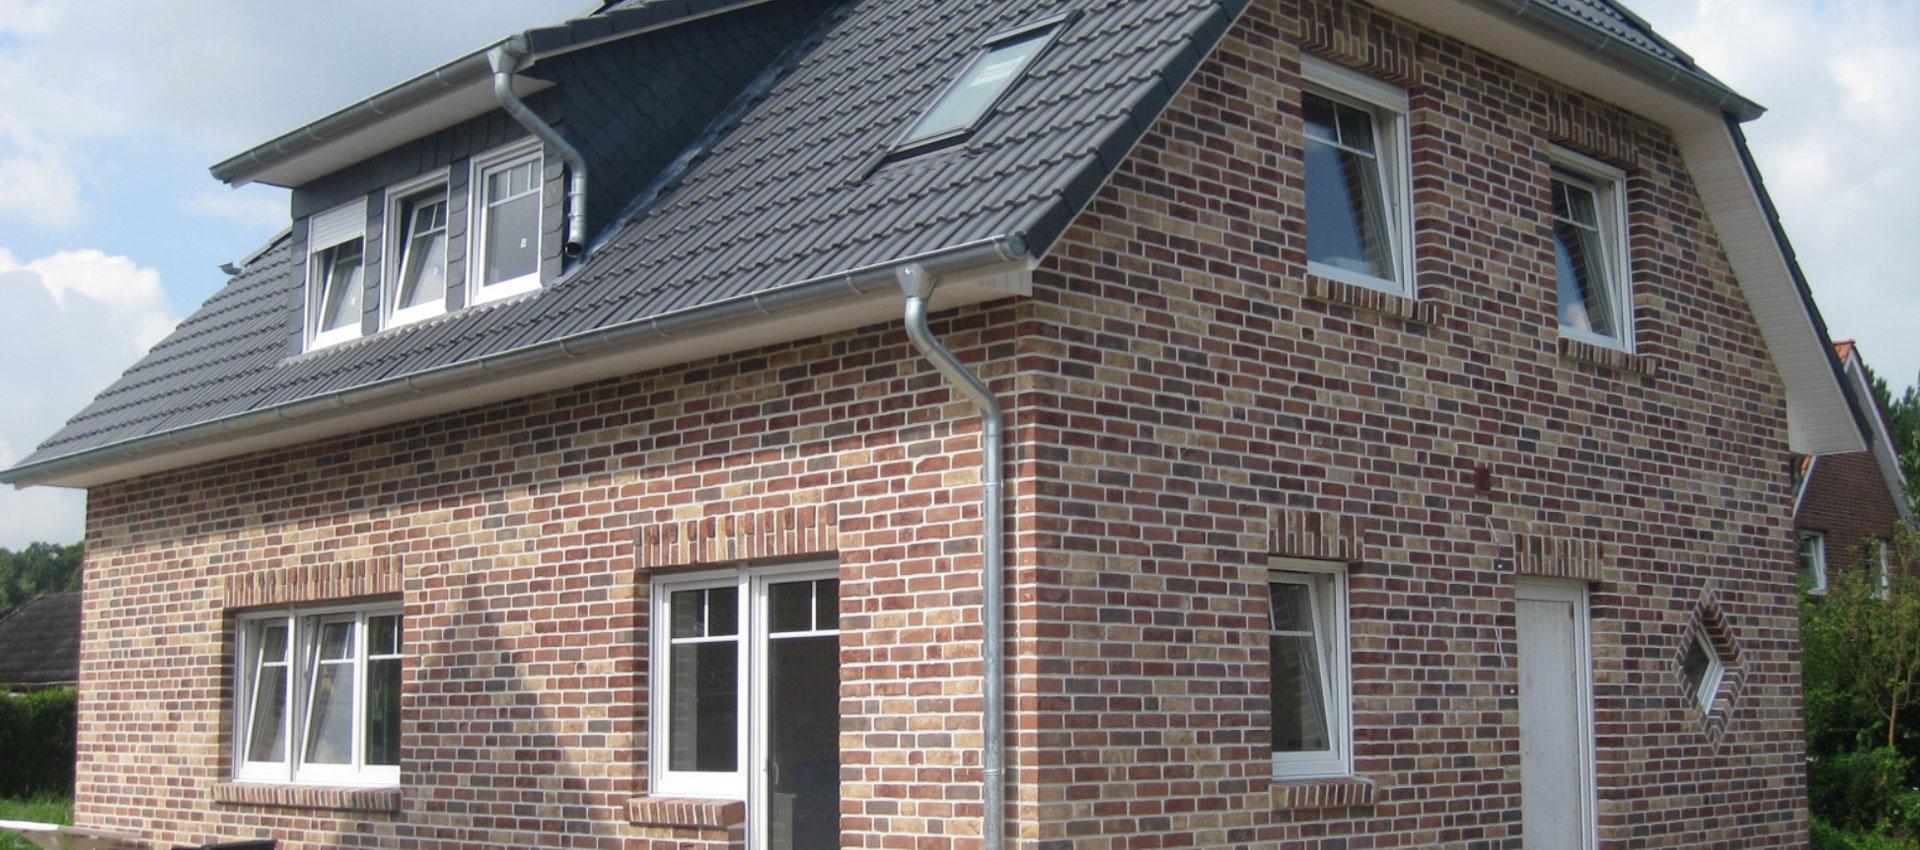 Haus im Bau PN1555